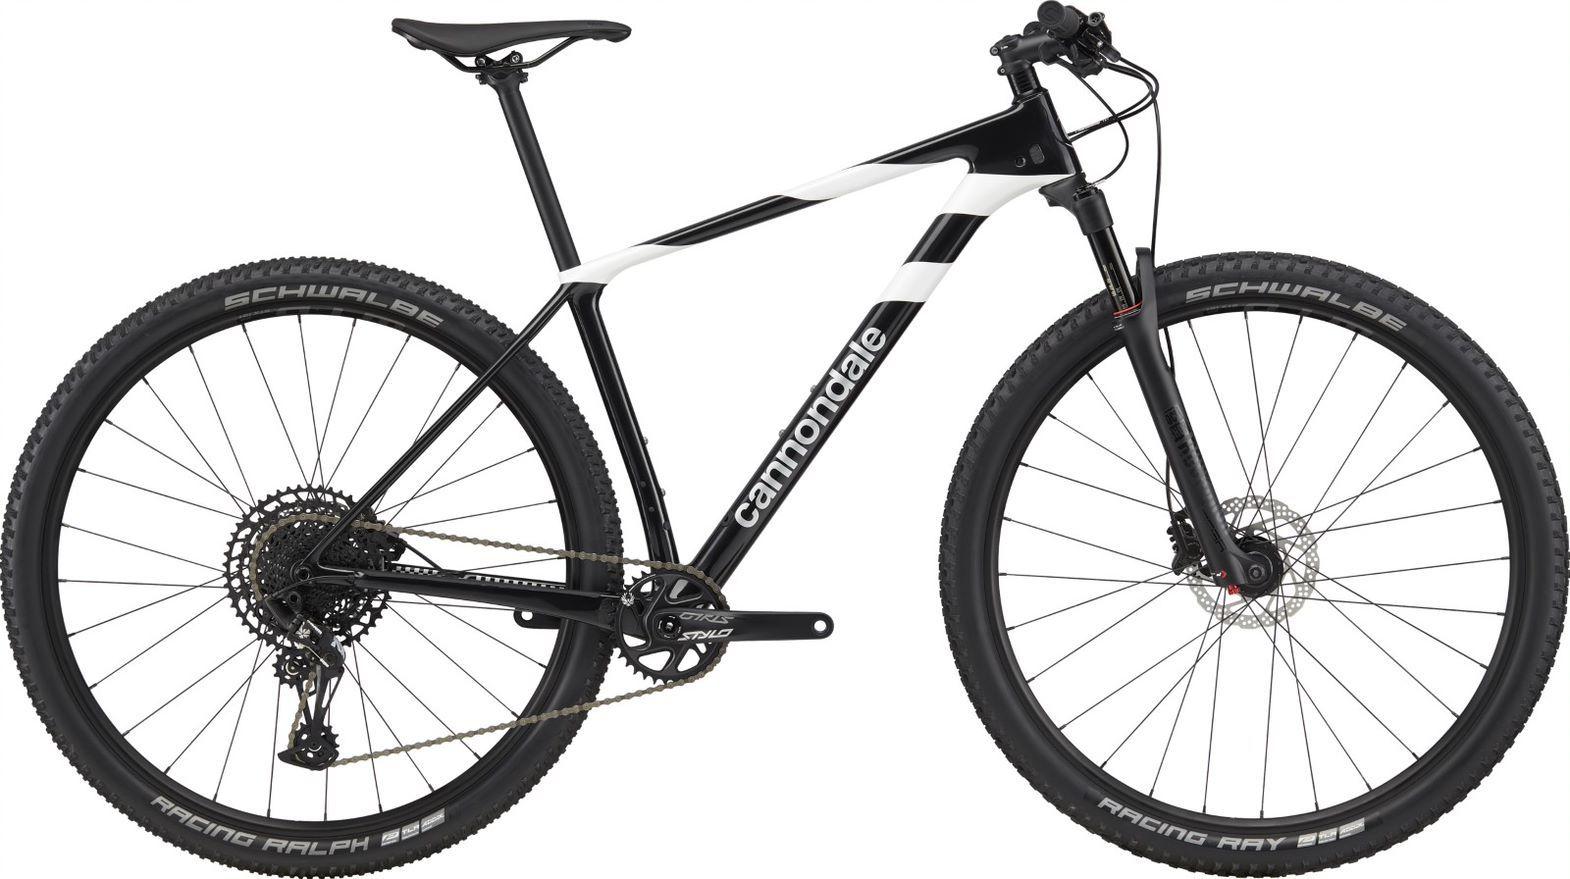 Cannondale F-si Carbon 5 Mountain Bike 2020 | Mountainbikes